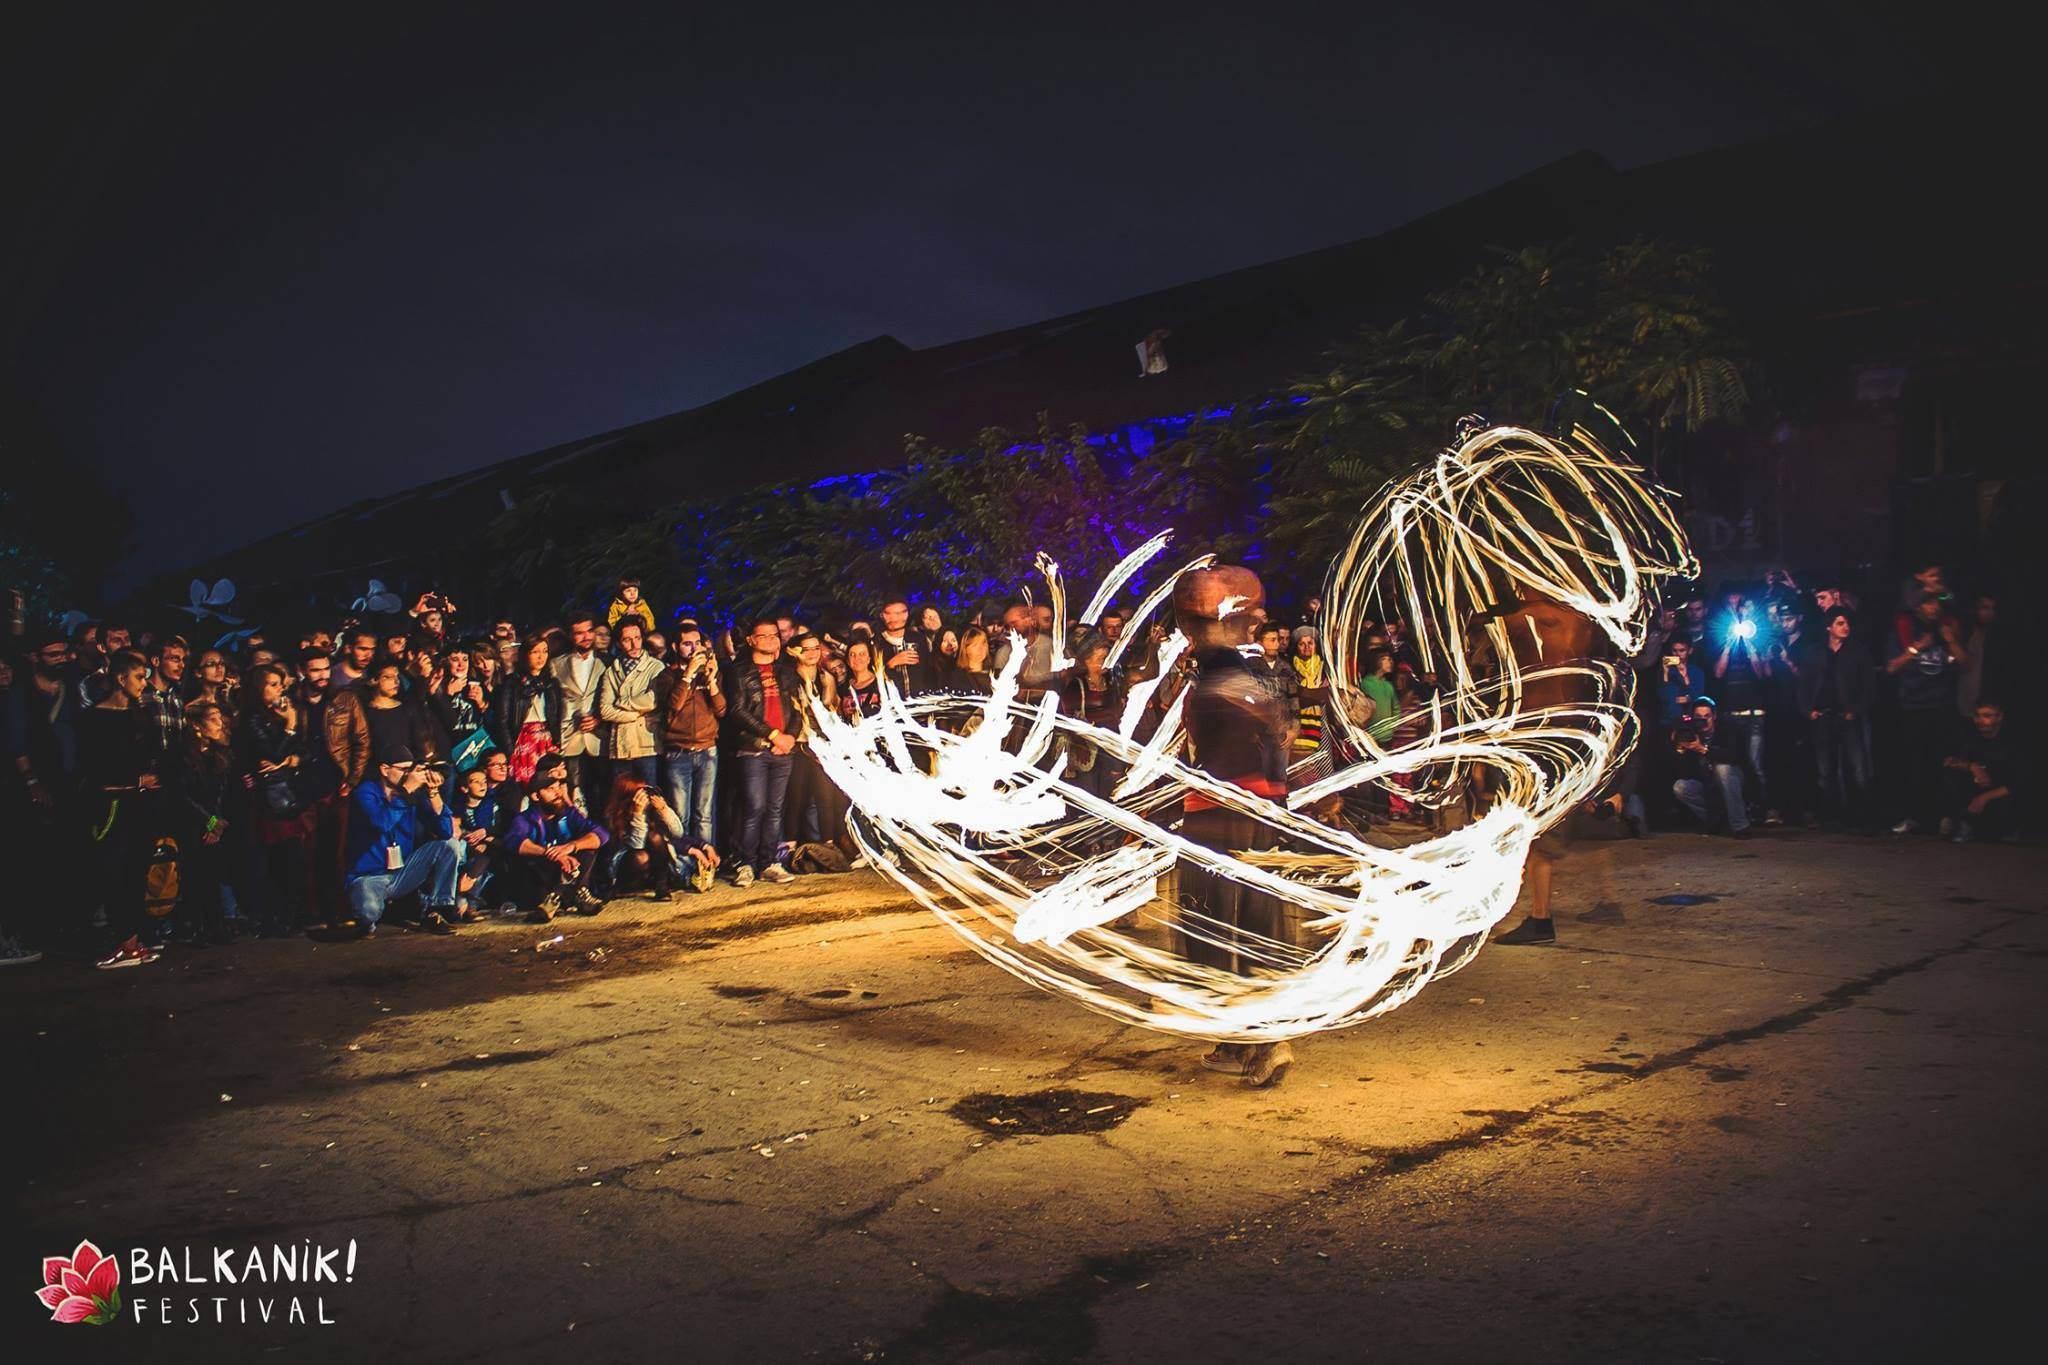 Top 3 evenimente in Orasul Meu: saptamana 5 - 11 septembrie 2016